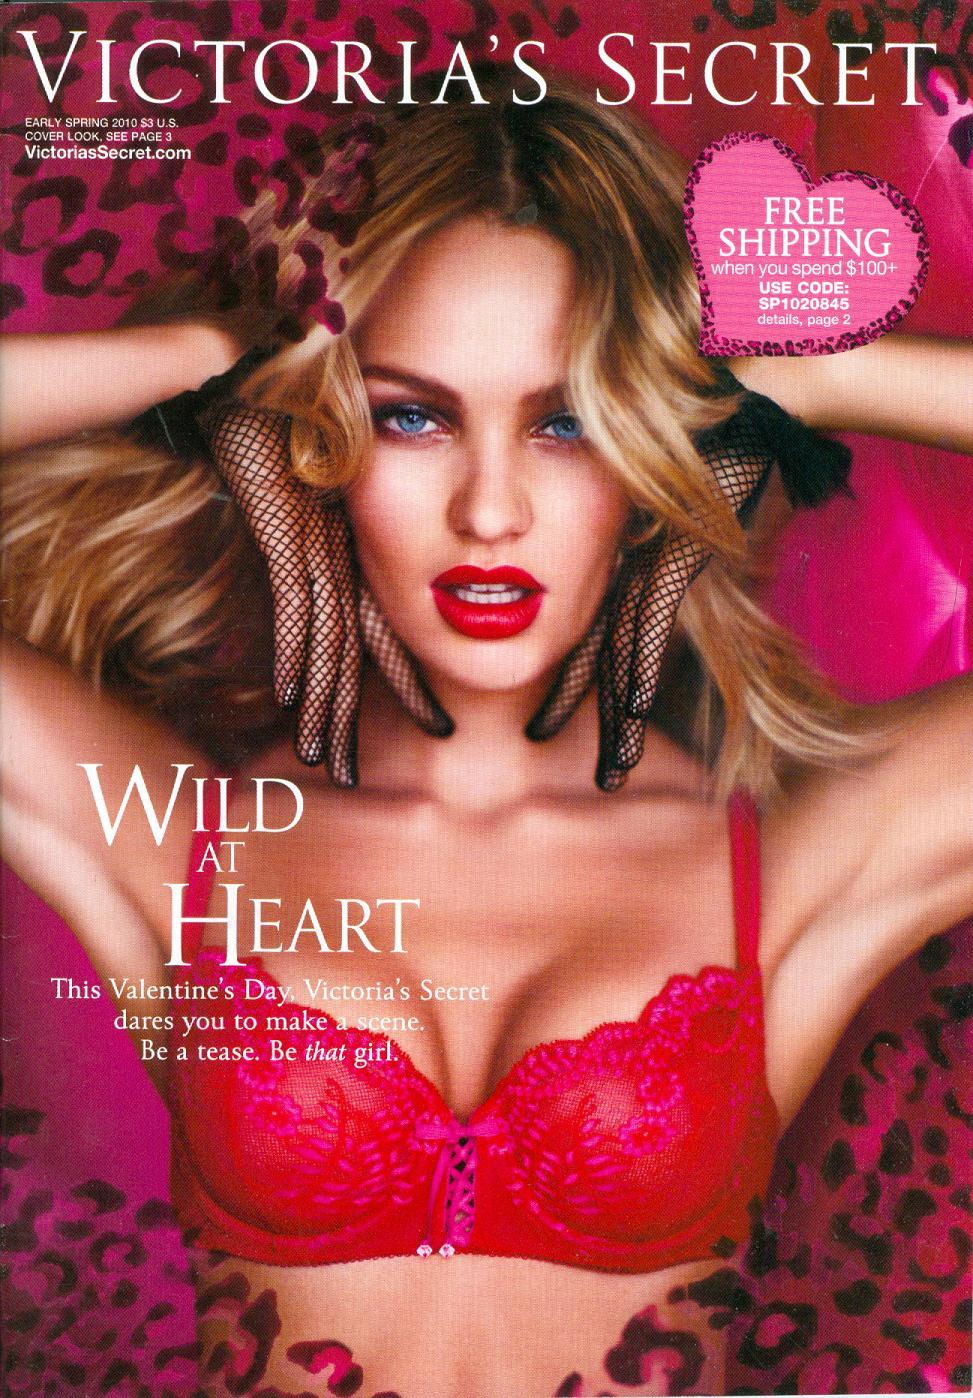 Candice Swanepoel Lingerie